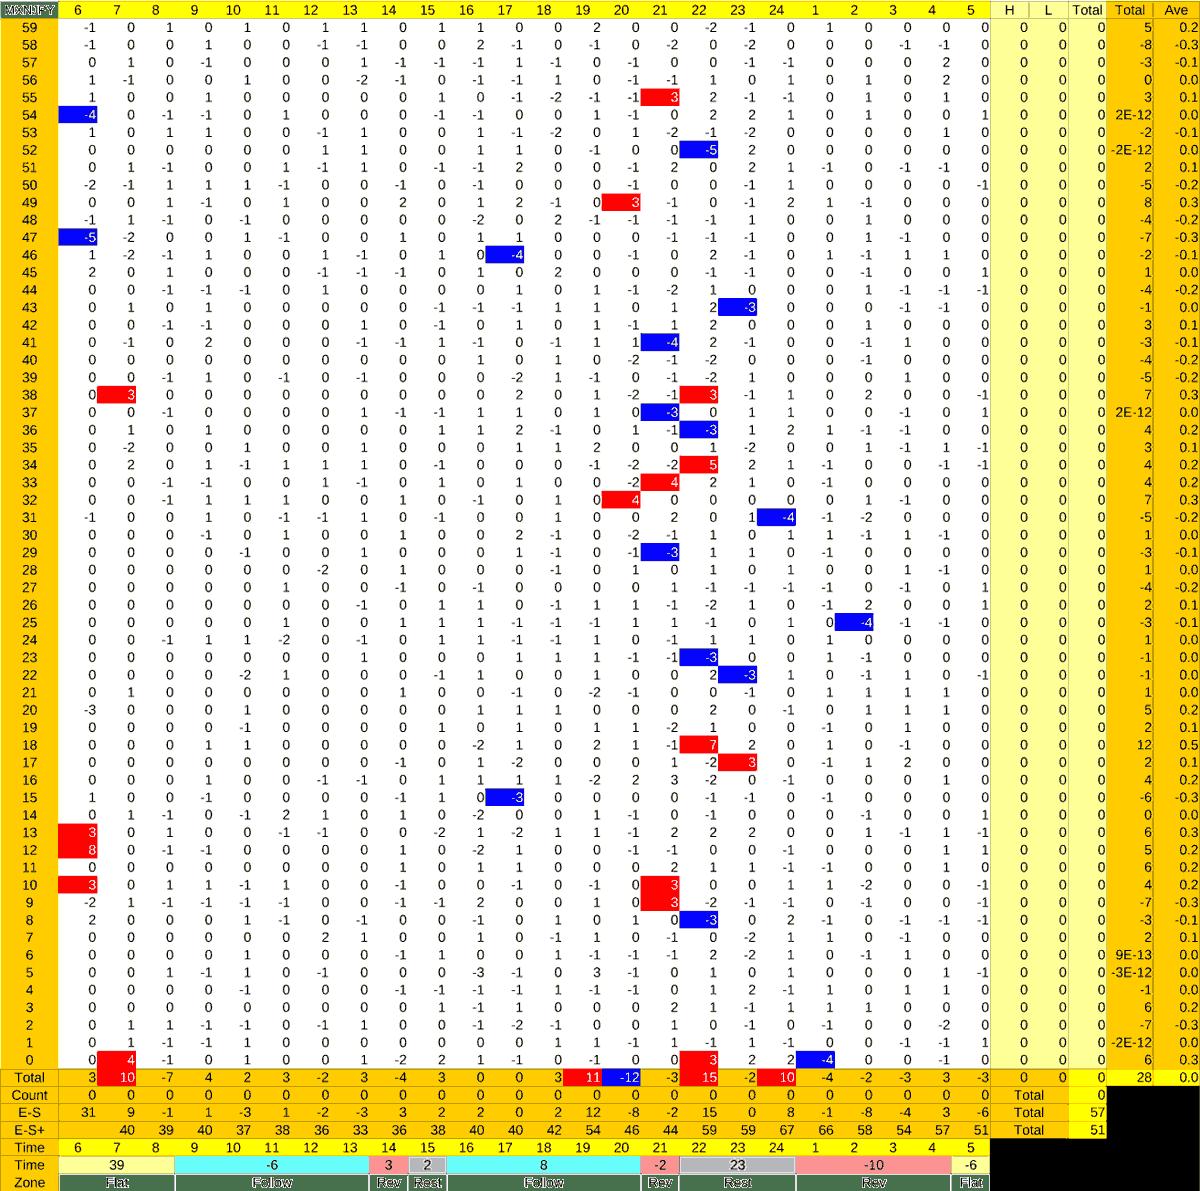 20210406_HS(3)MXNJPY